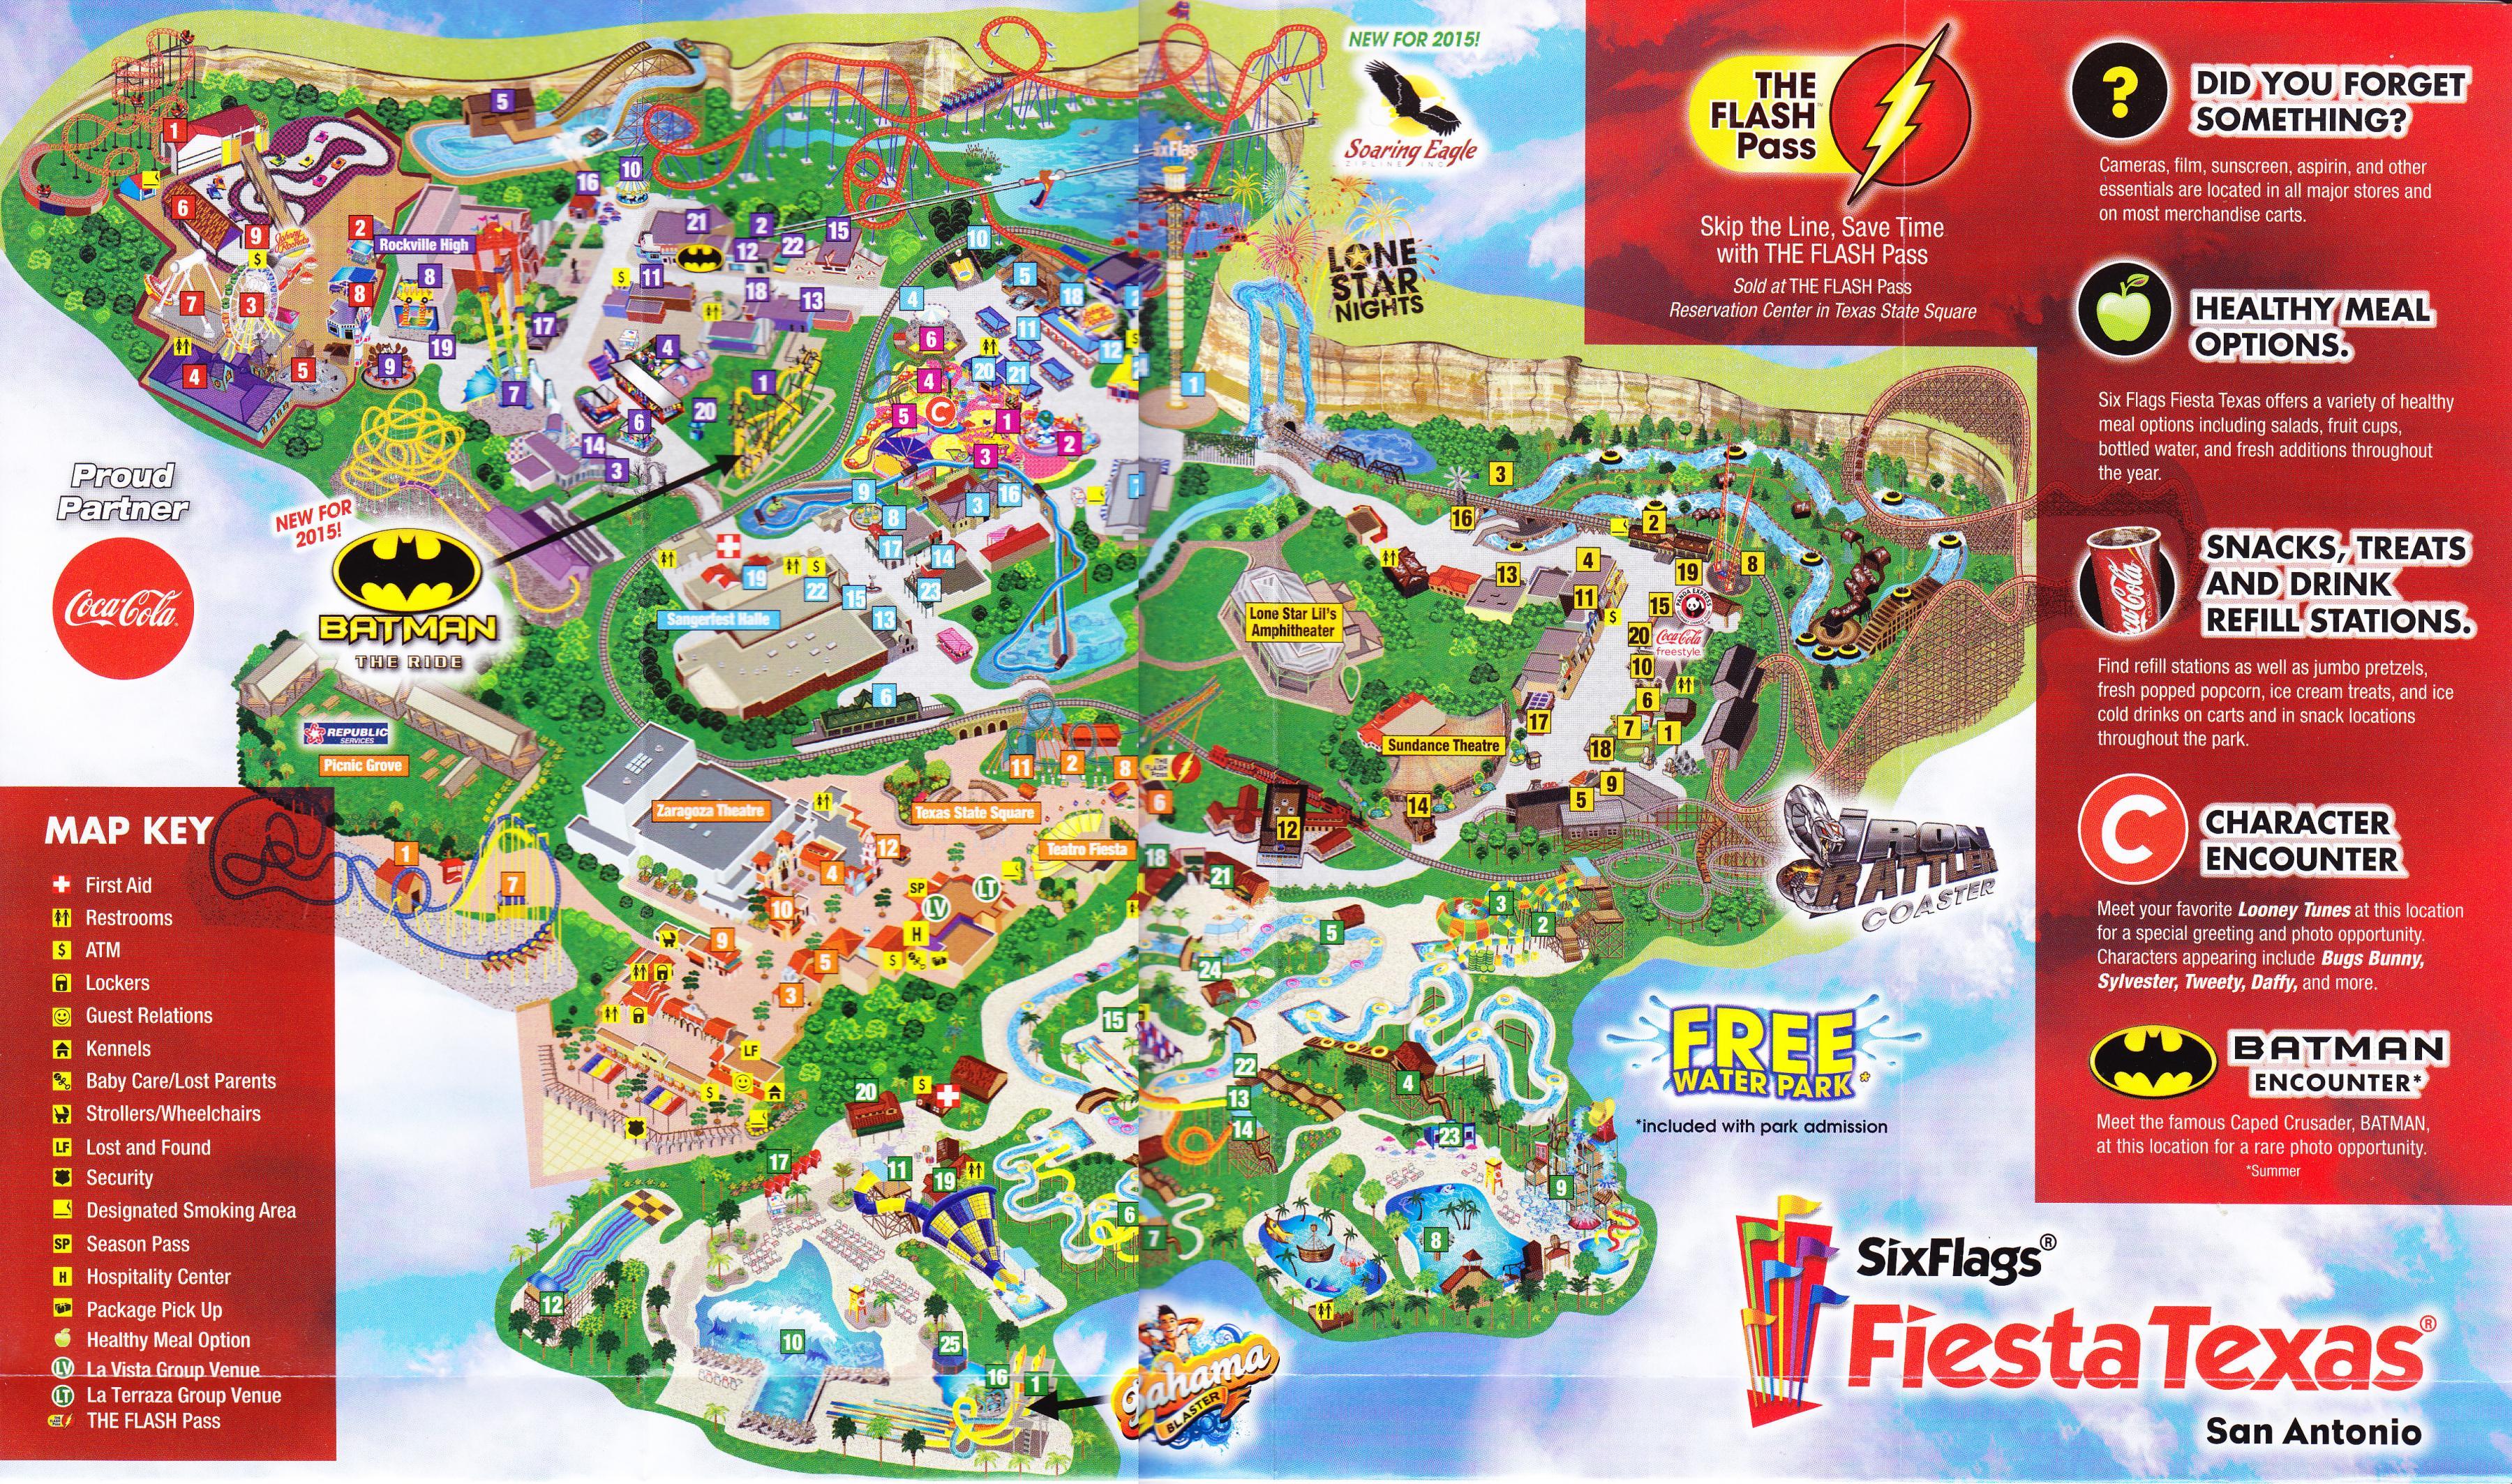 Six Flags Fiesta Texas Carte - Six Flags De San Antonio De La Carte - Fiesta Texas Map